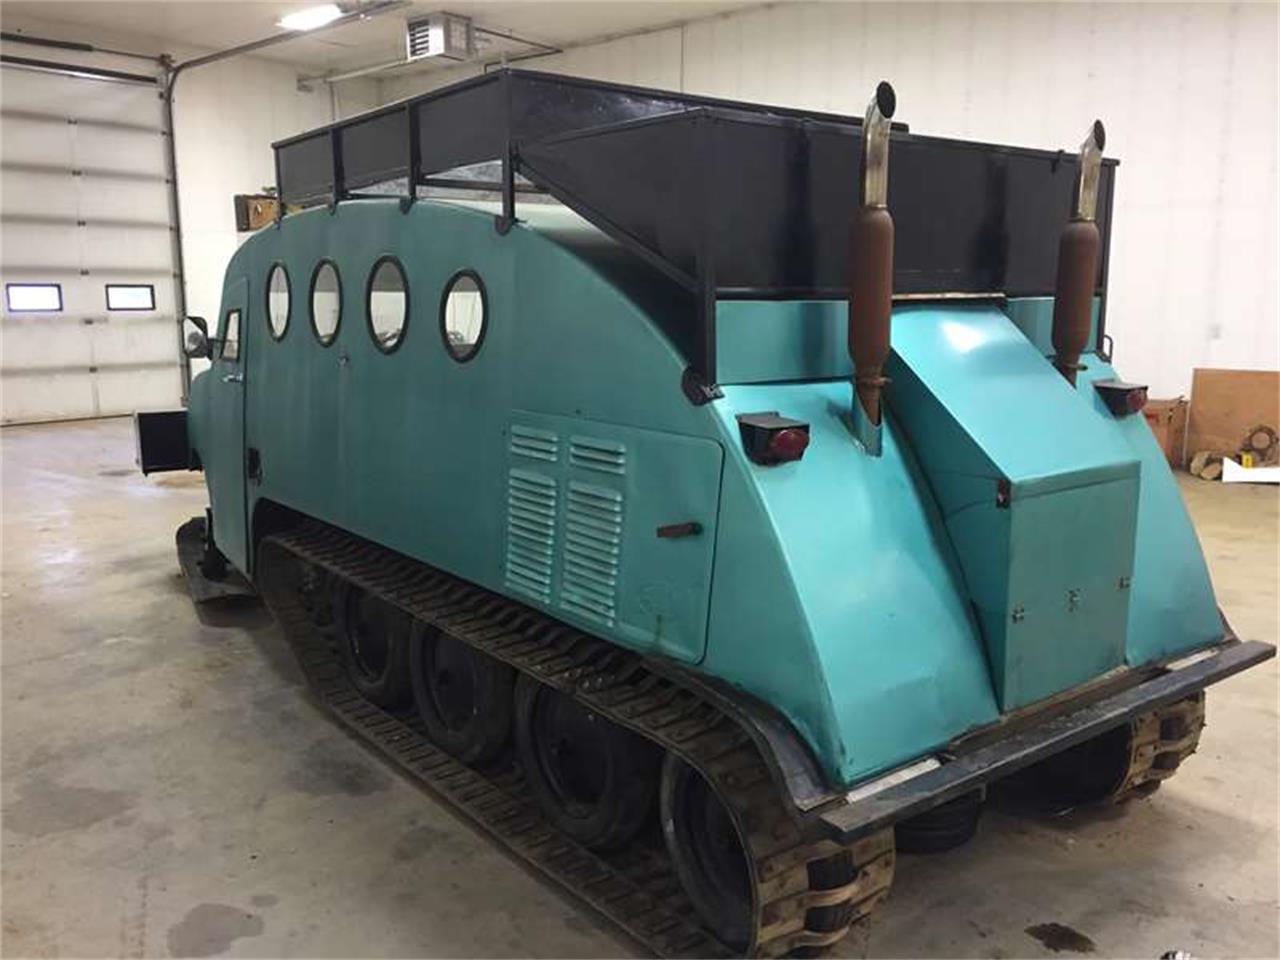 Autoneige 1940 auto neige bombardier wide gauge snowmobile for sale